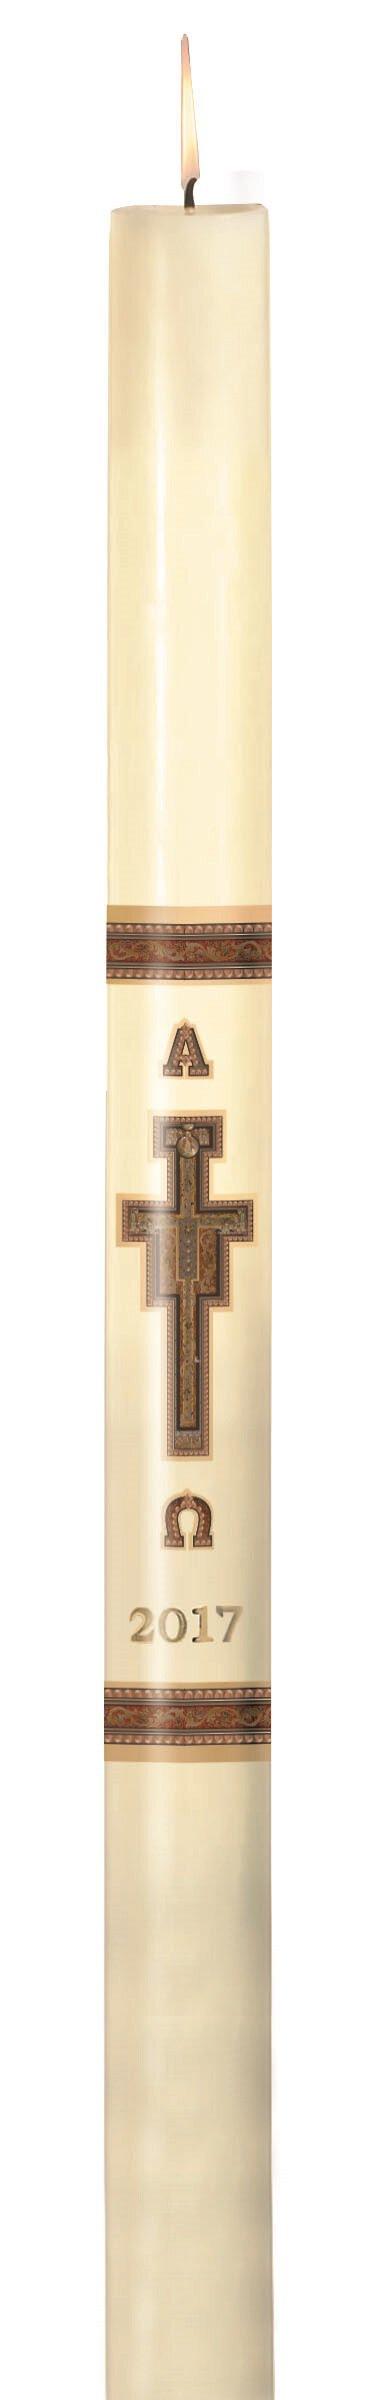 No 6 San Damiano Paschal Candle